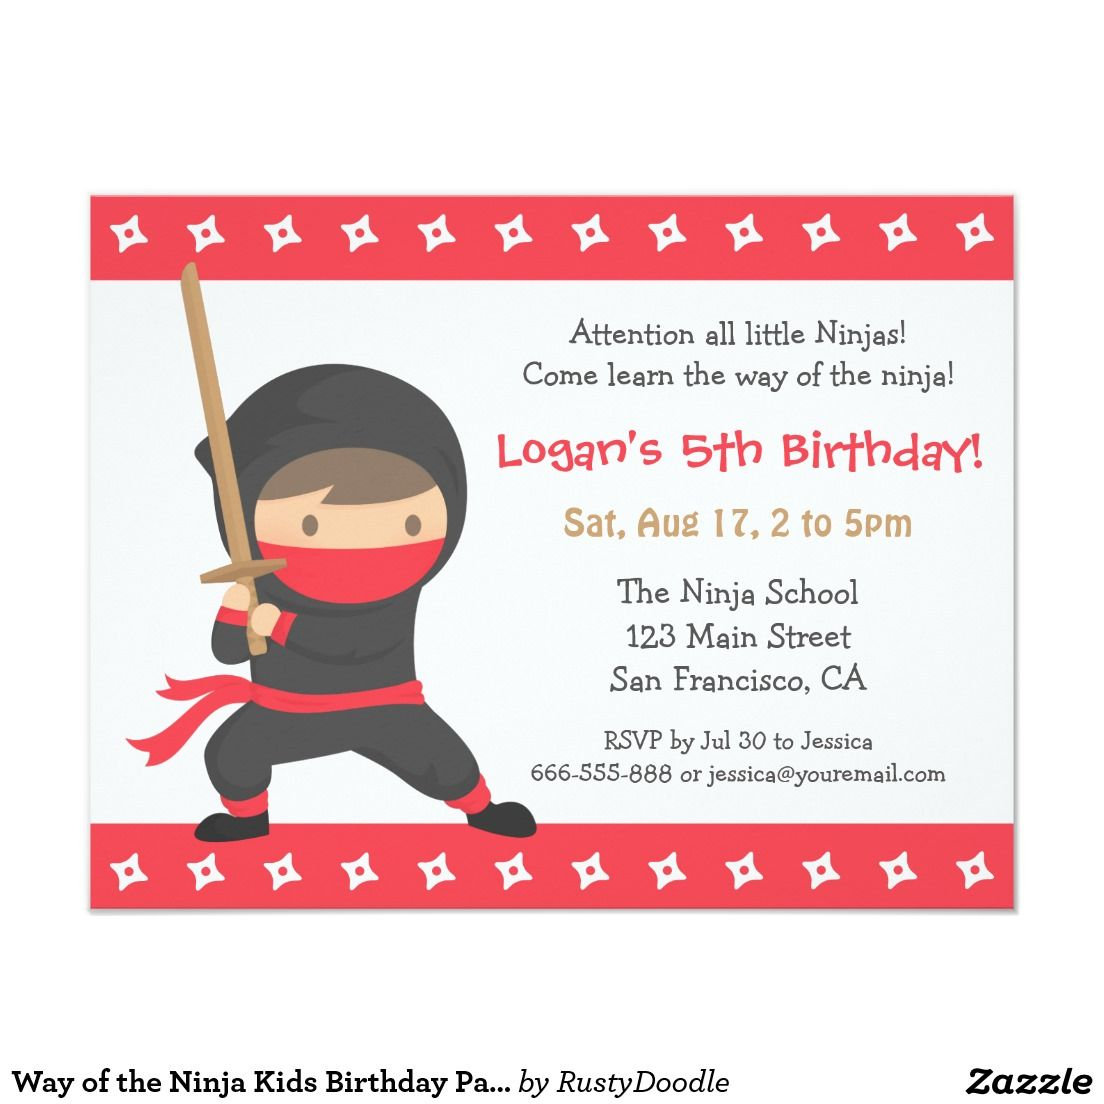 Way of the Ninja Kids Birthday Party Invitations | Kids birthday ...